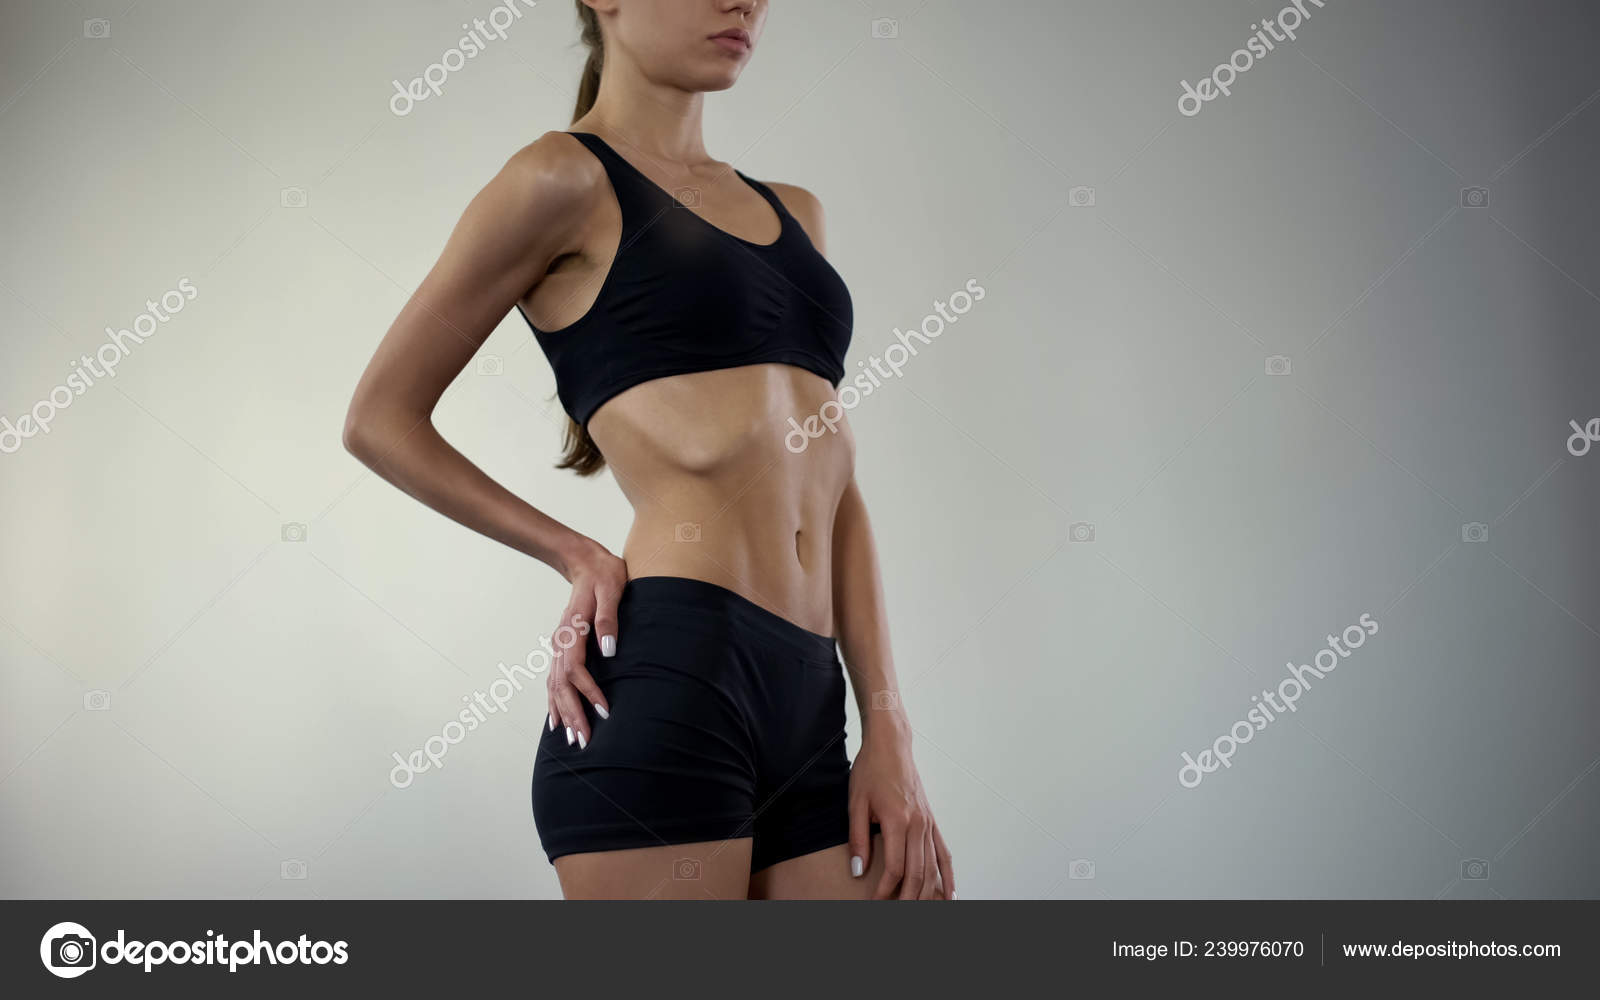 Gewichtsverlust HIV-Symptom